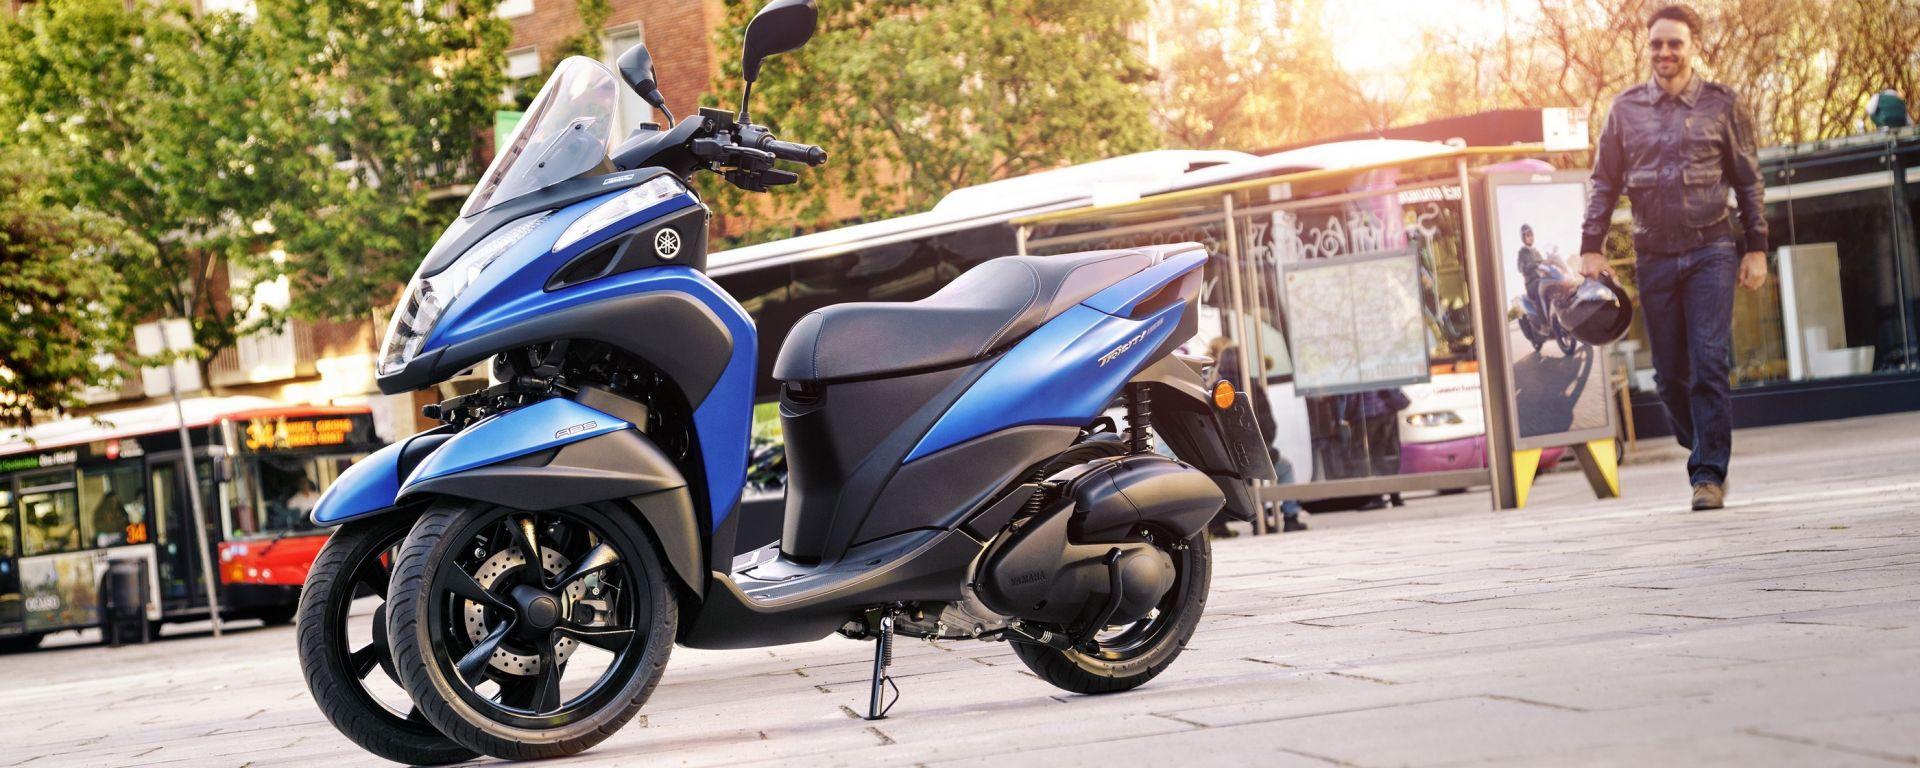 Yamaha Tricity 155: finalmente mette le ruote in autostrada